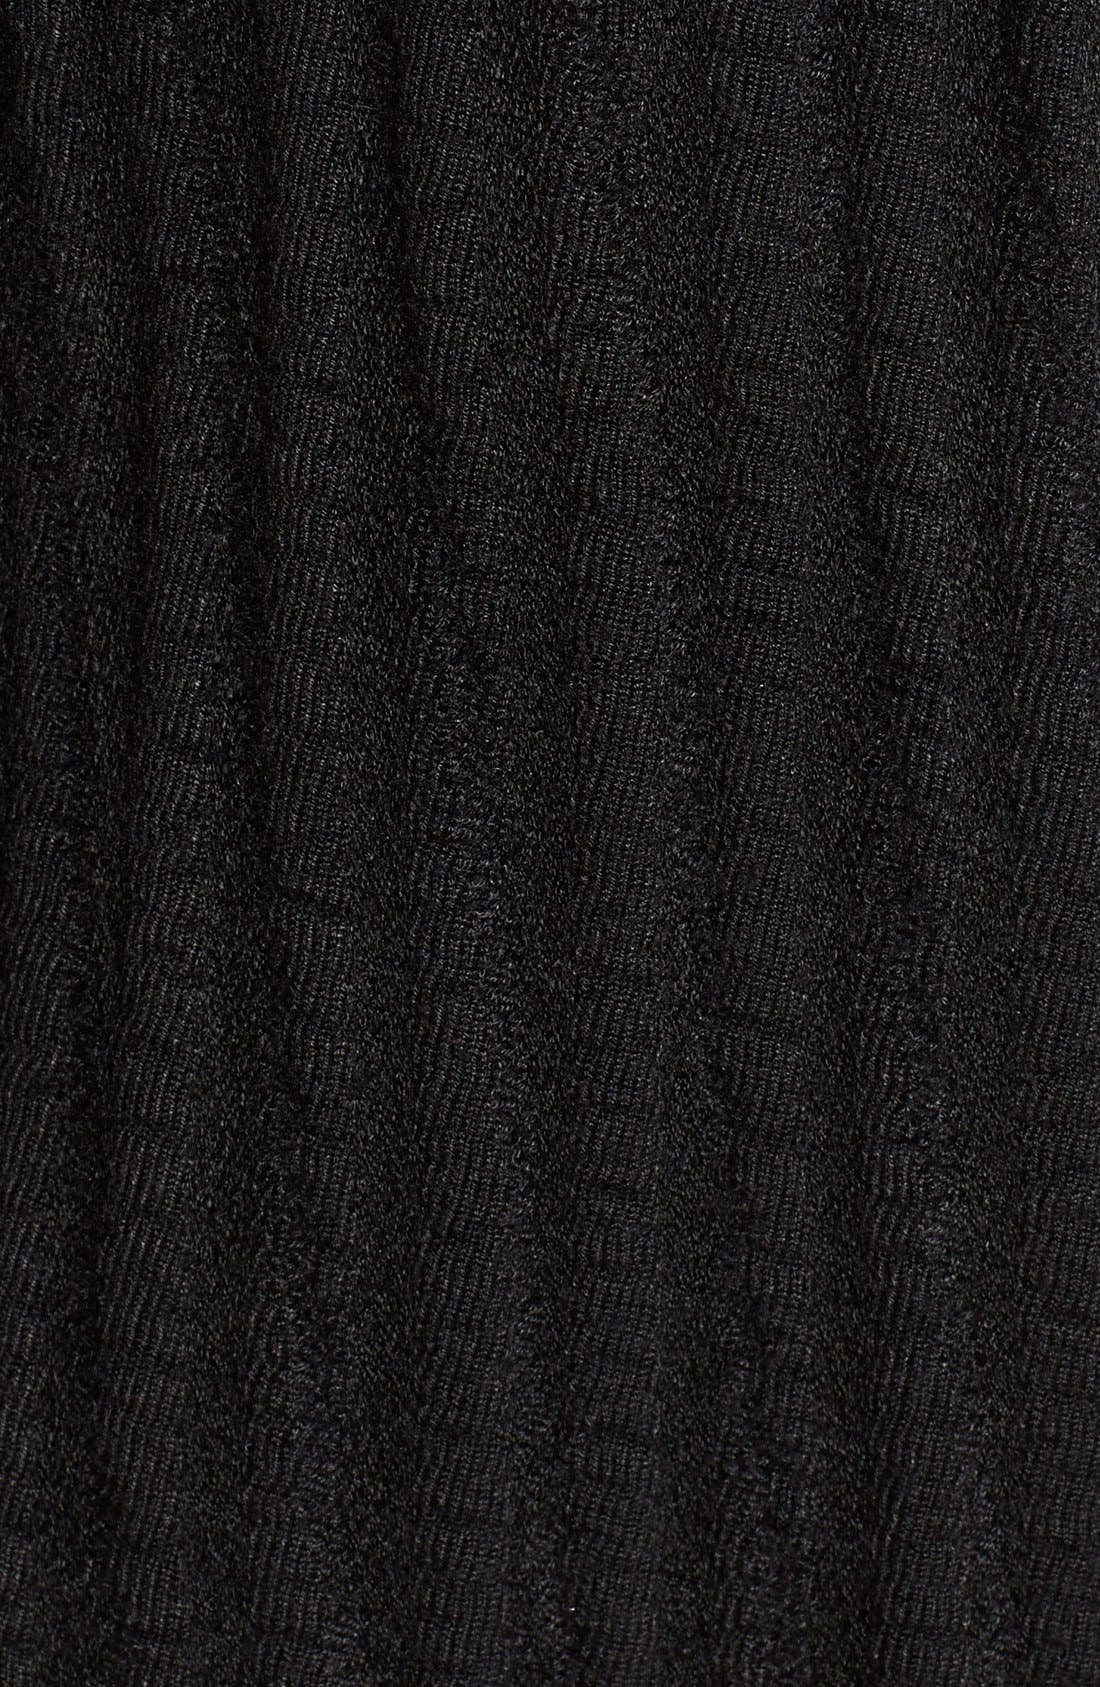 Drape Front Long Sweater Jacket,                             Alternate thumbnail 5, color,                             001